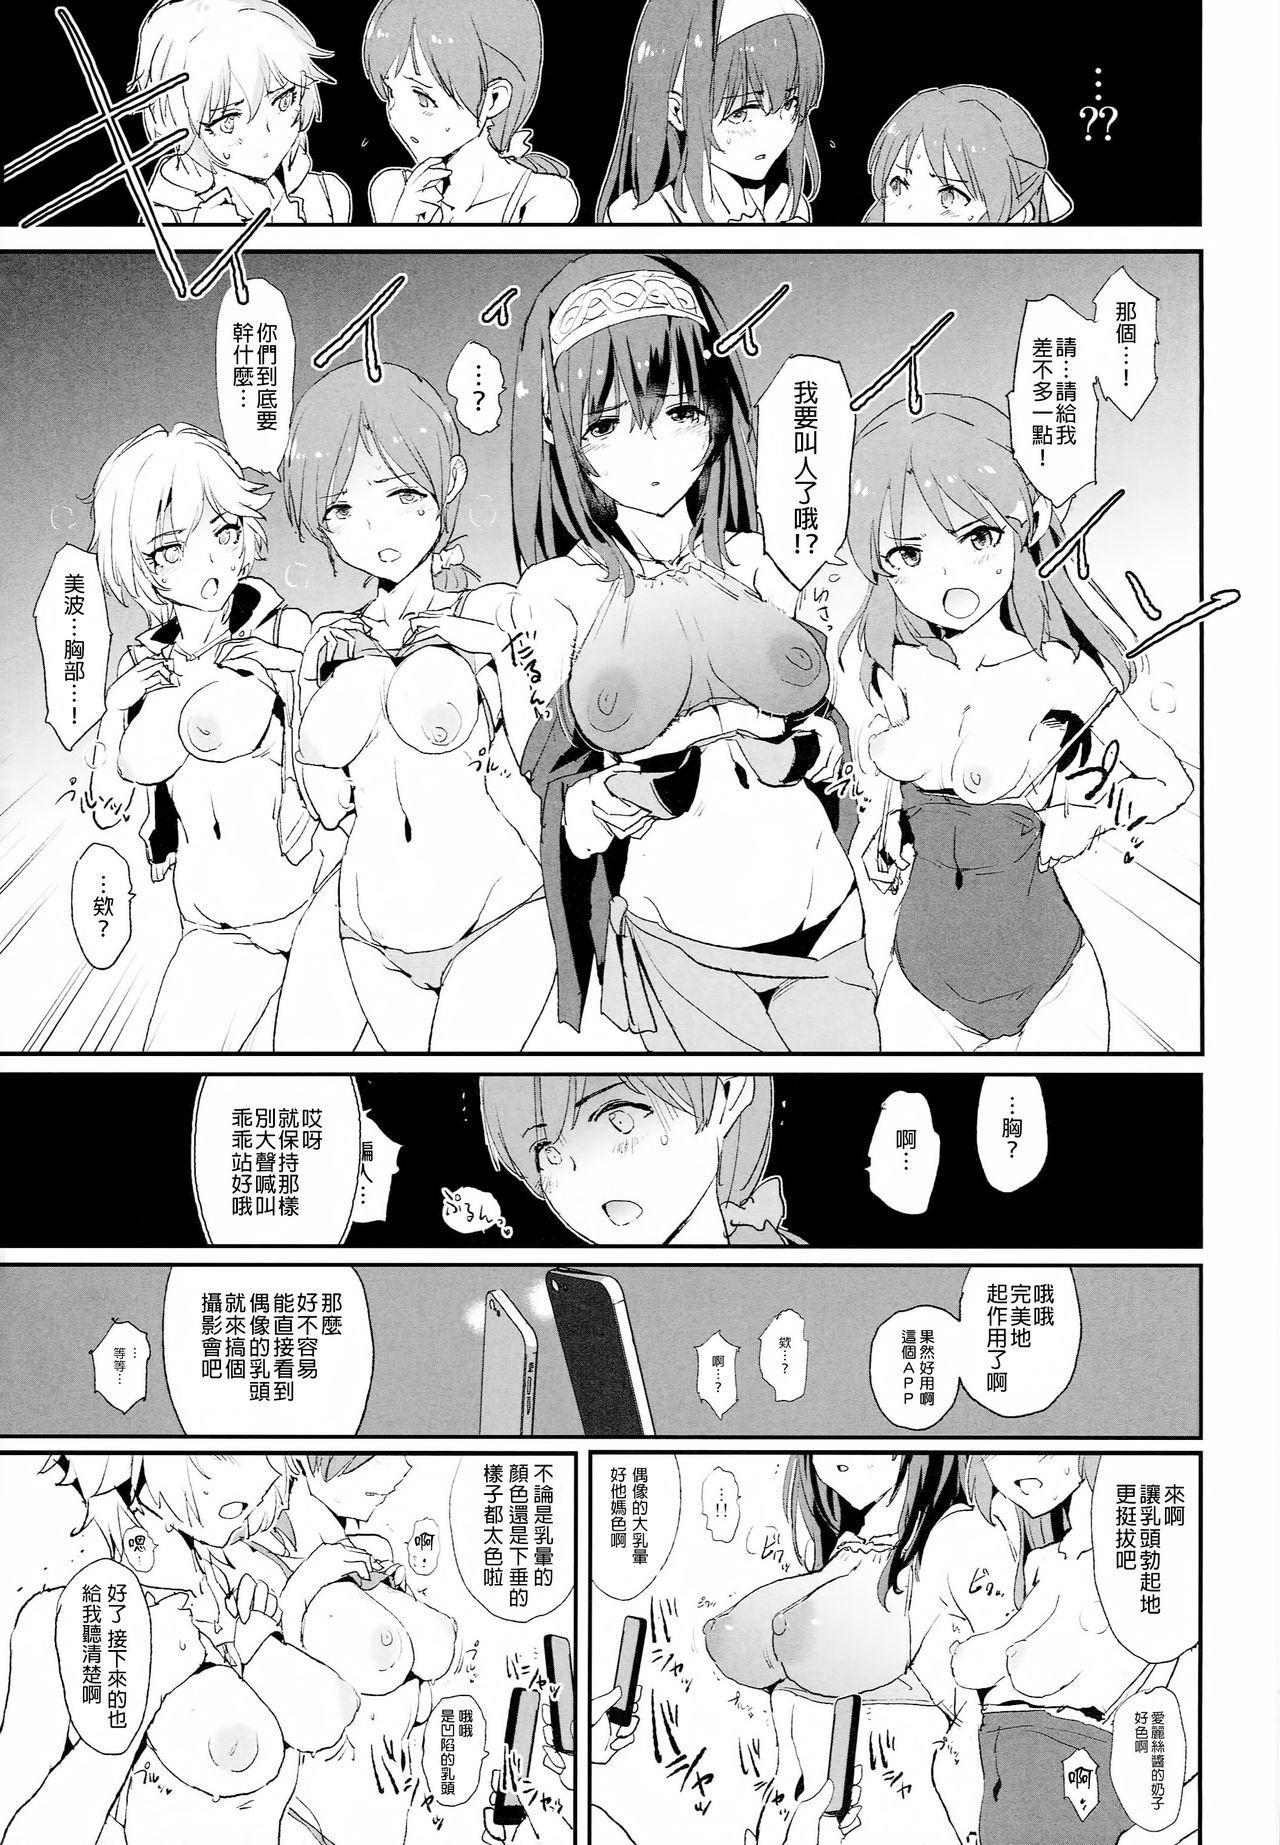 Tachibana Arisu no Saimin Dosukebe Sex Friends with Sagisawa Fumika + Omake Paper 3